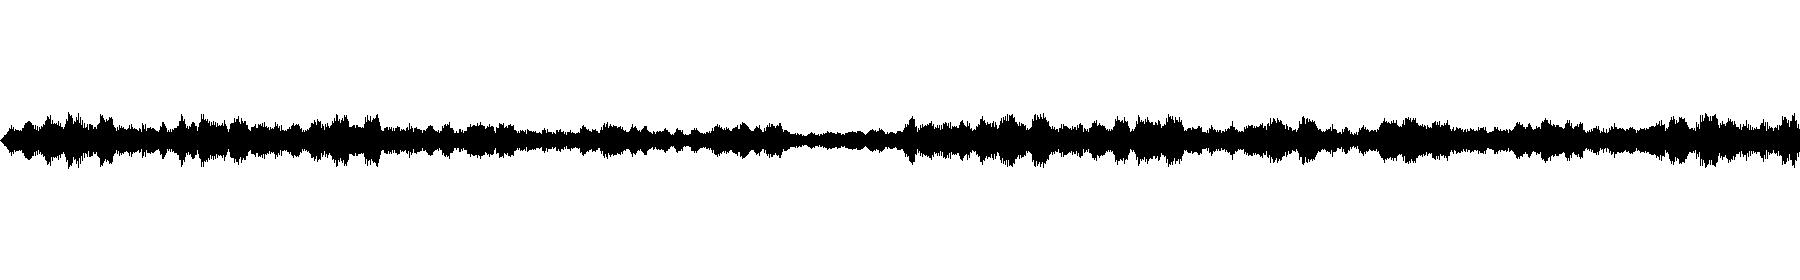 dreamstate flute chords   120bpm   fmin